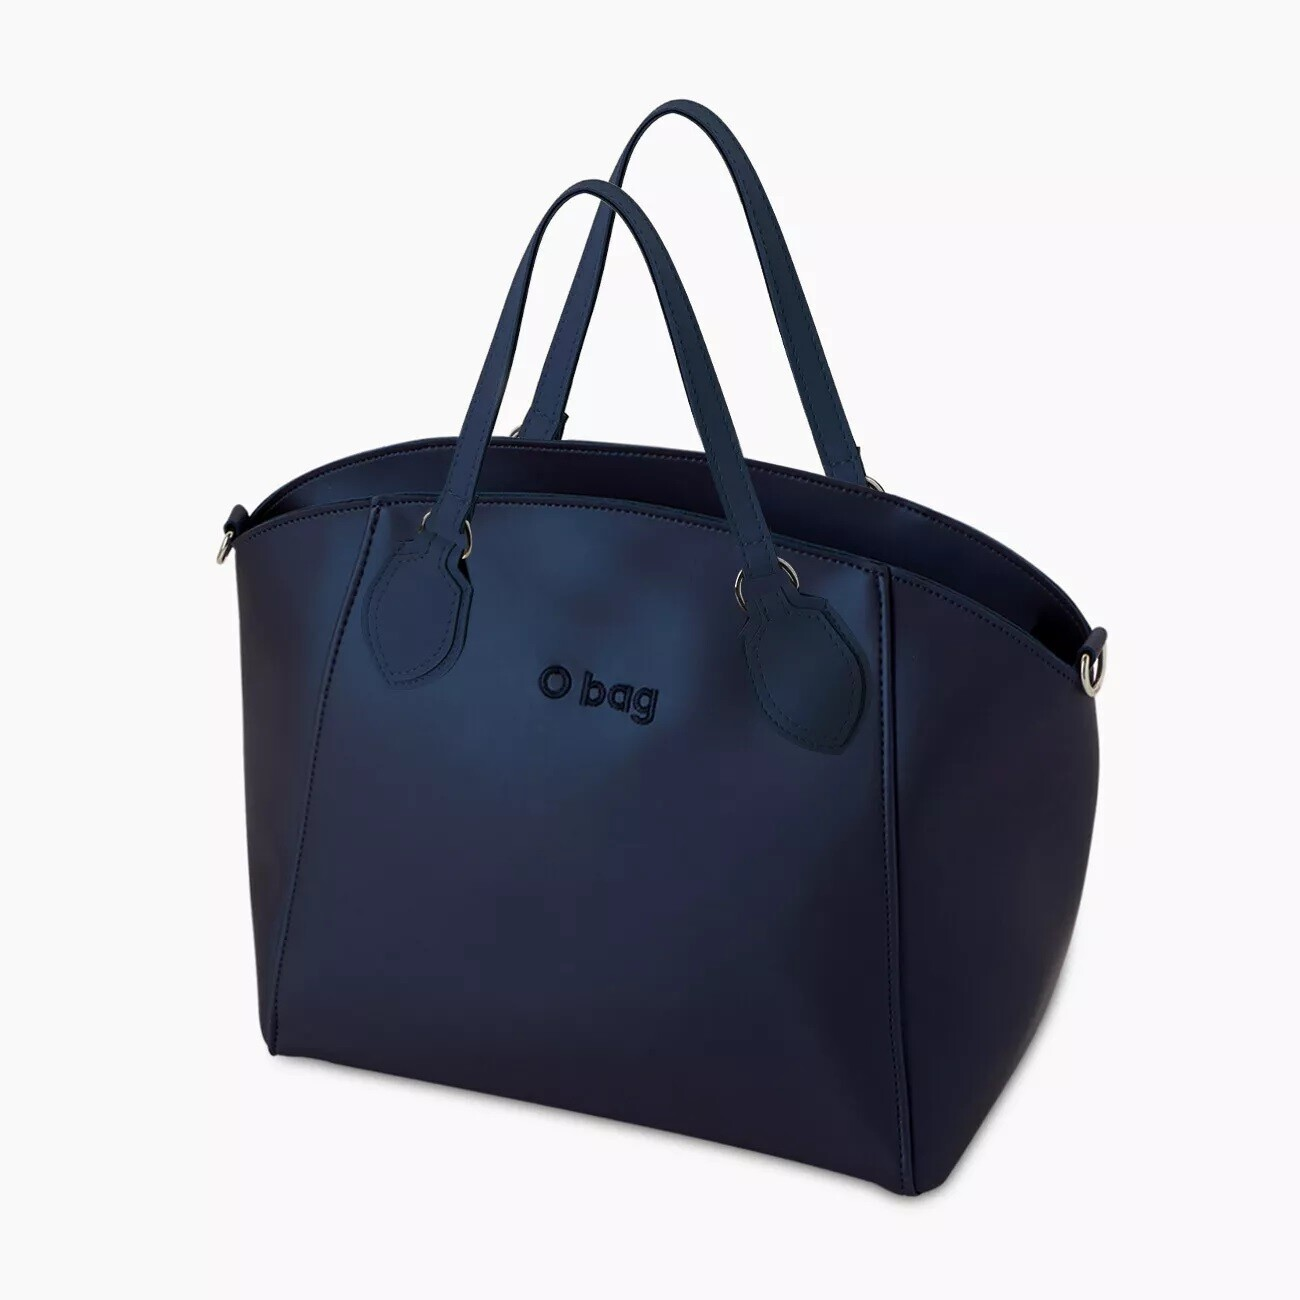 O bag soft mild blue navy metal